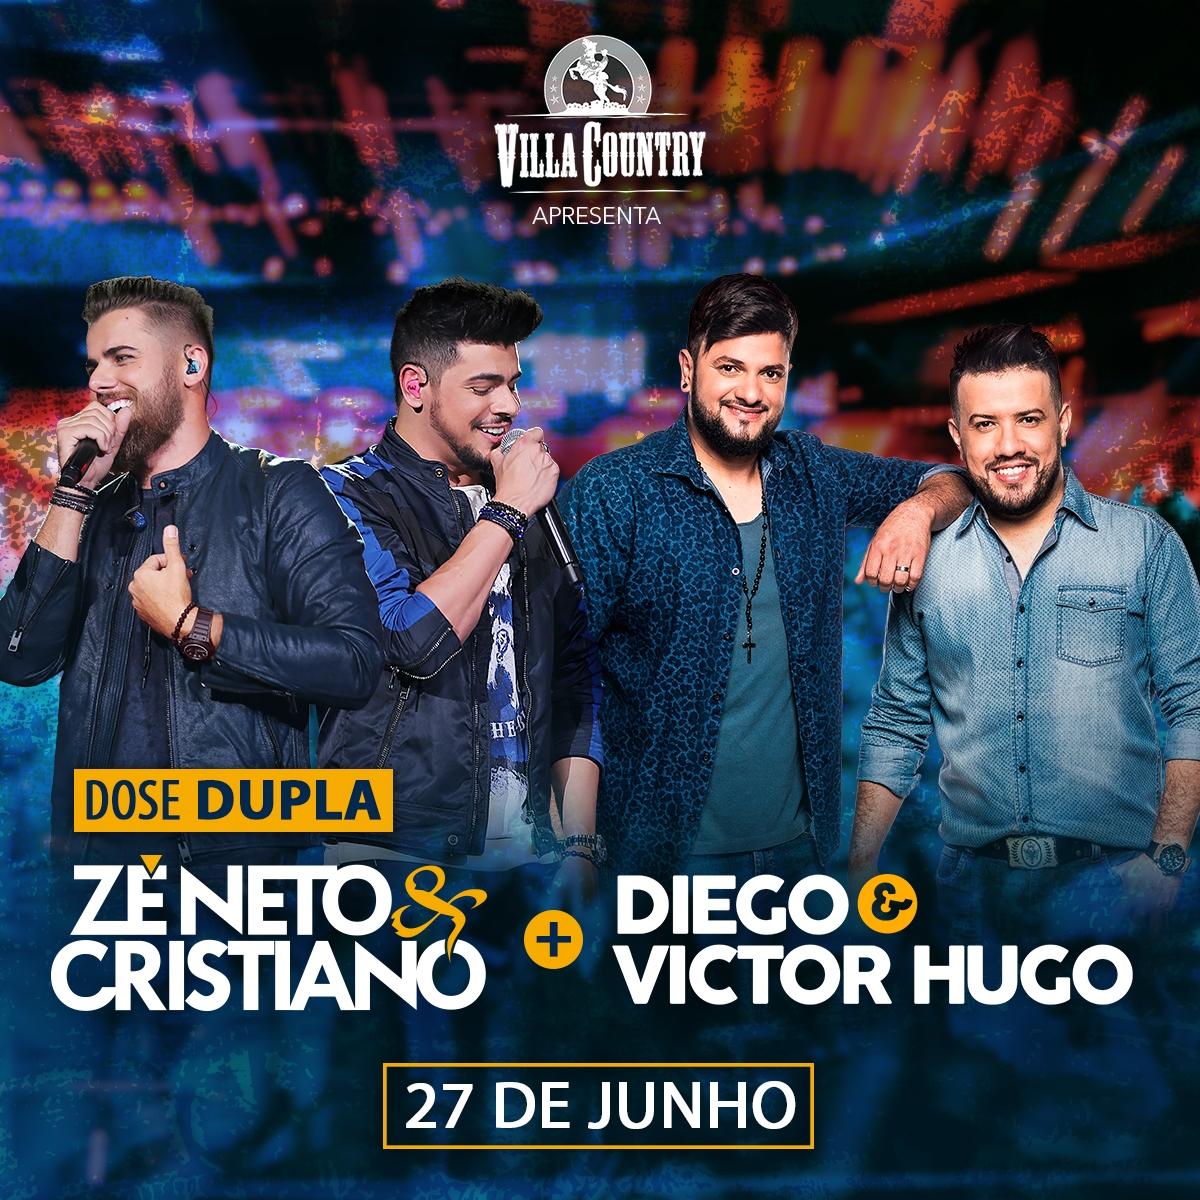 Zé Neto e Cristiano e Diego e Victor Hugo se apresentam no Villa Country 41